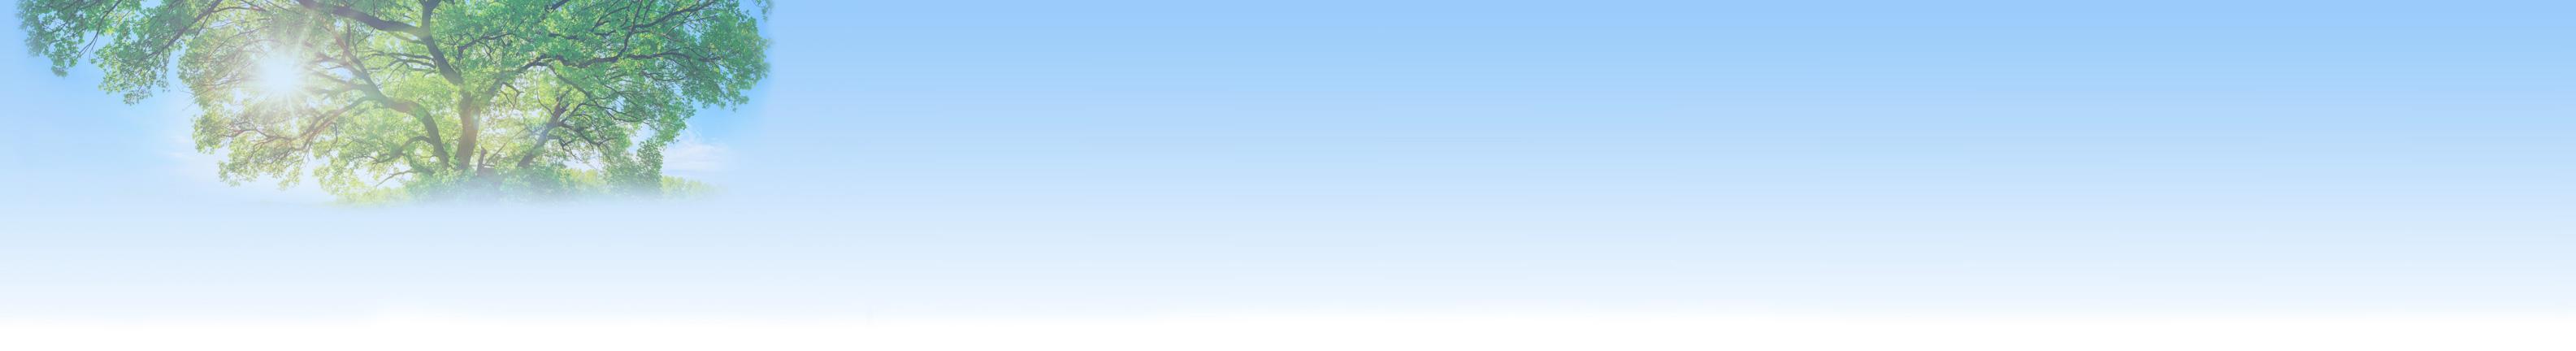 header-baum-blau1.jpg